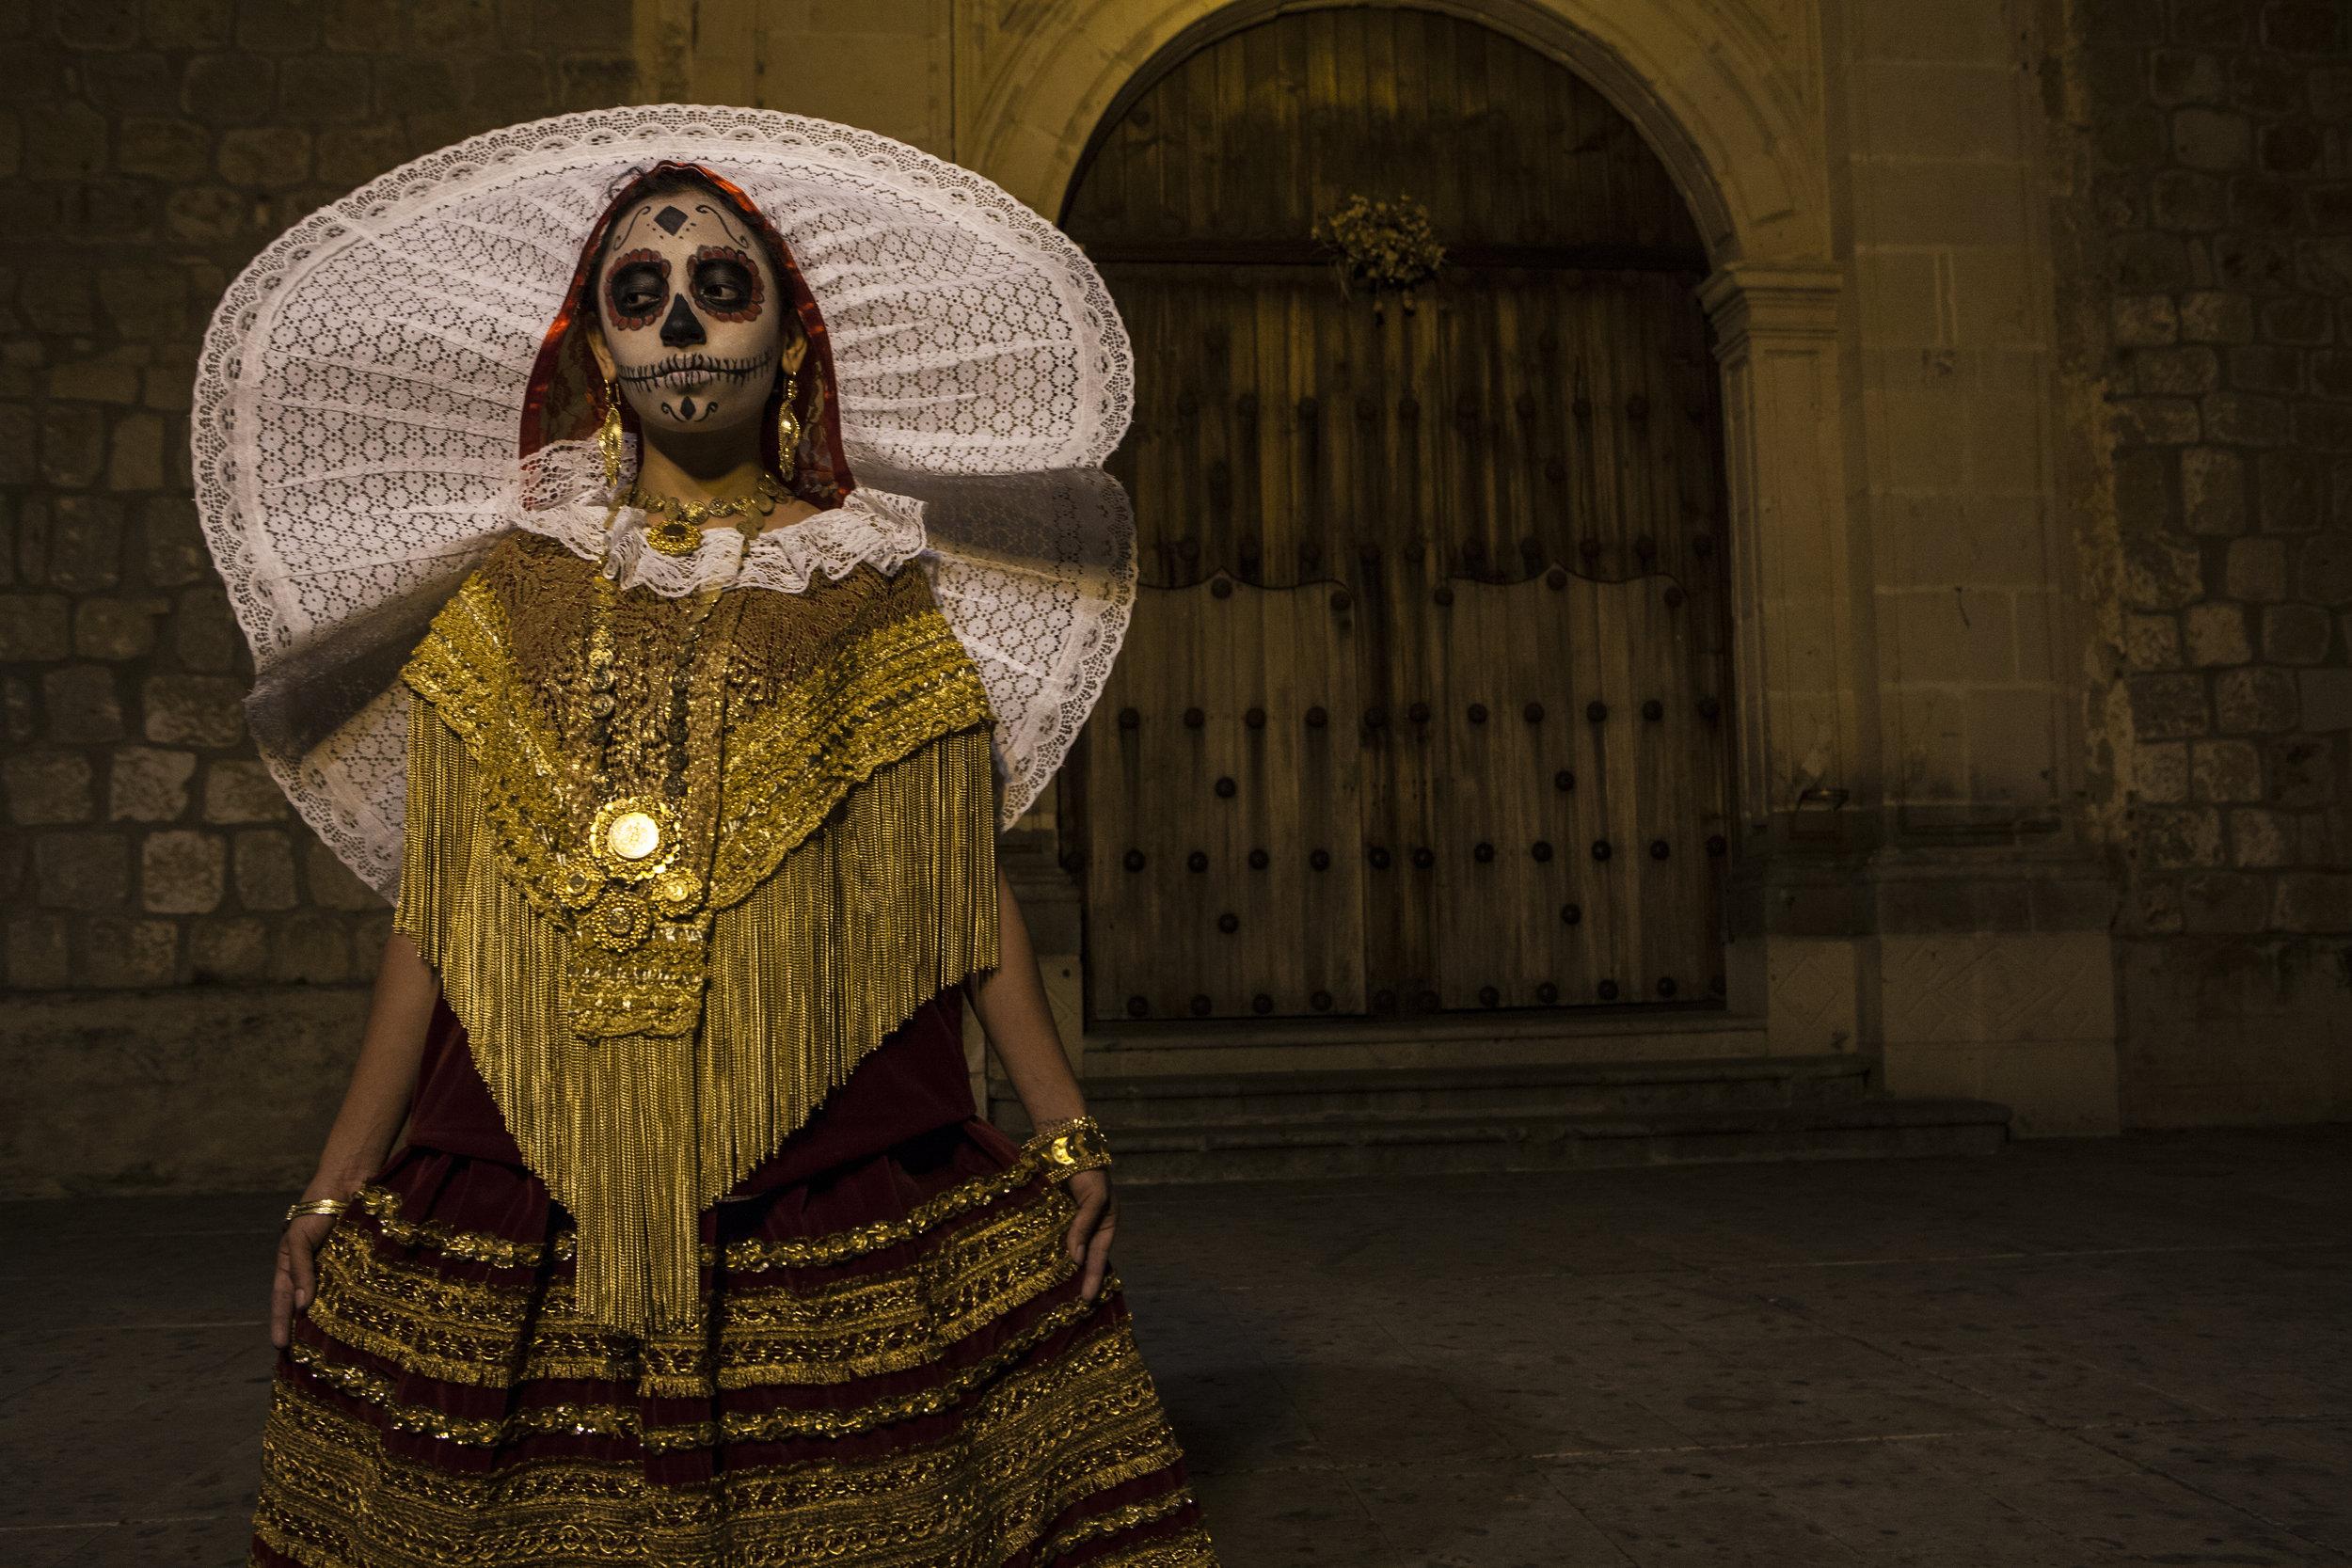 Juan Escobedo, La Muertita de Oro, Digital Photography.jpg